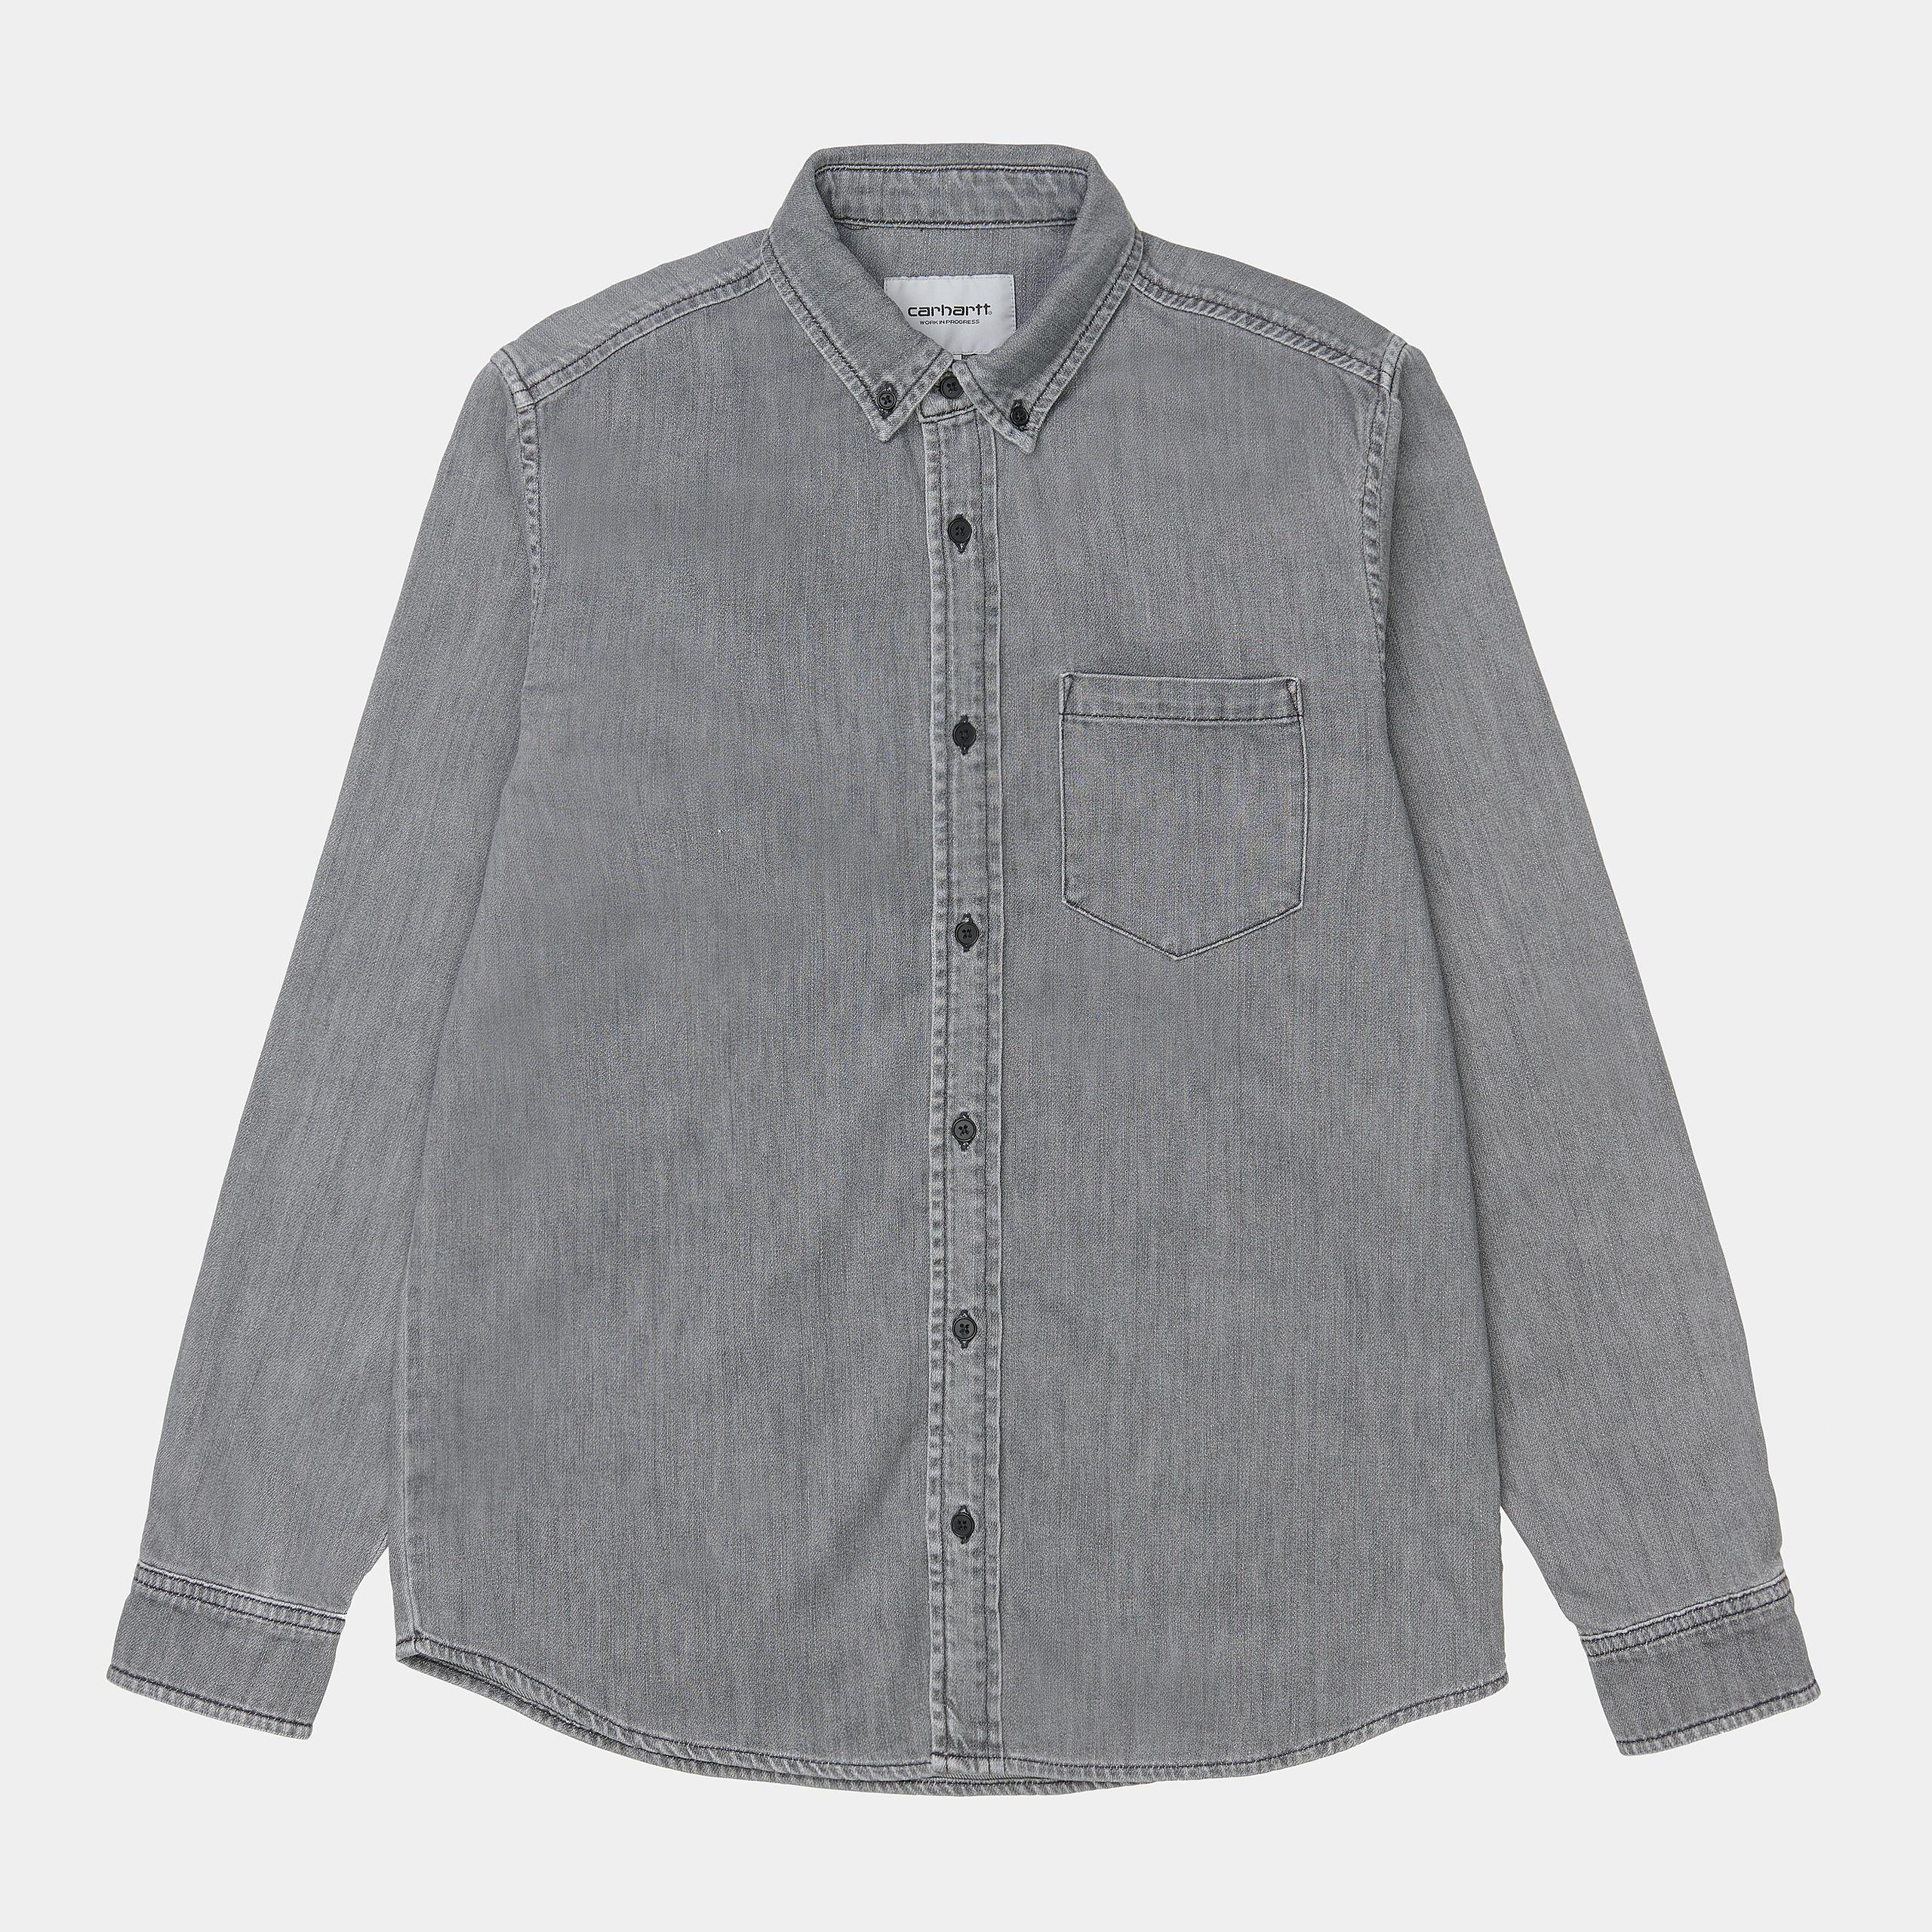 L/S Civil Shirt T400® Black Bleached CARHARTT